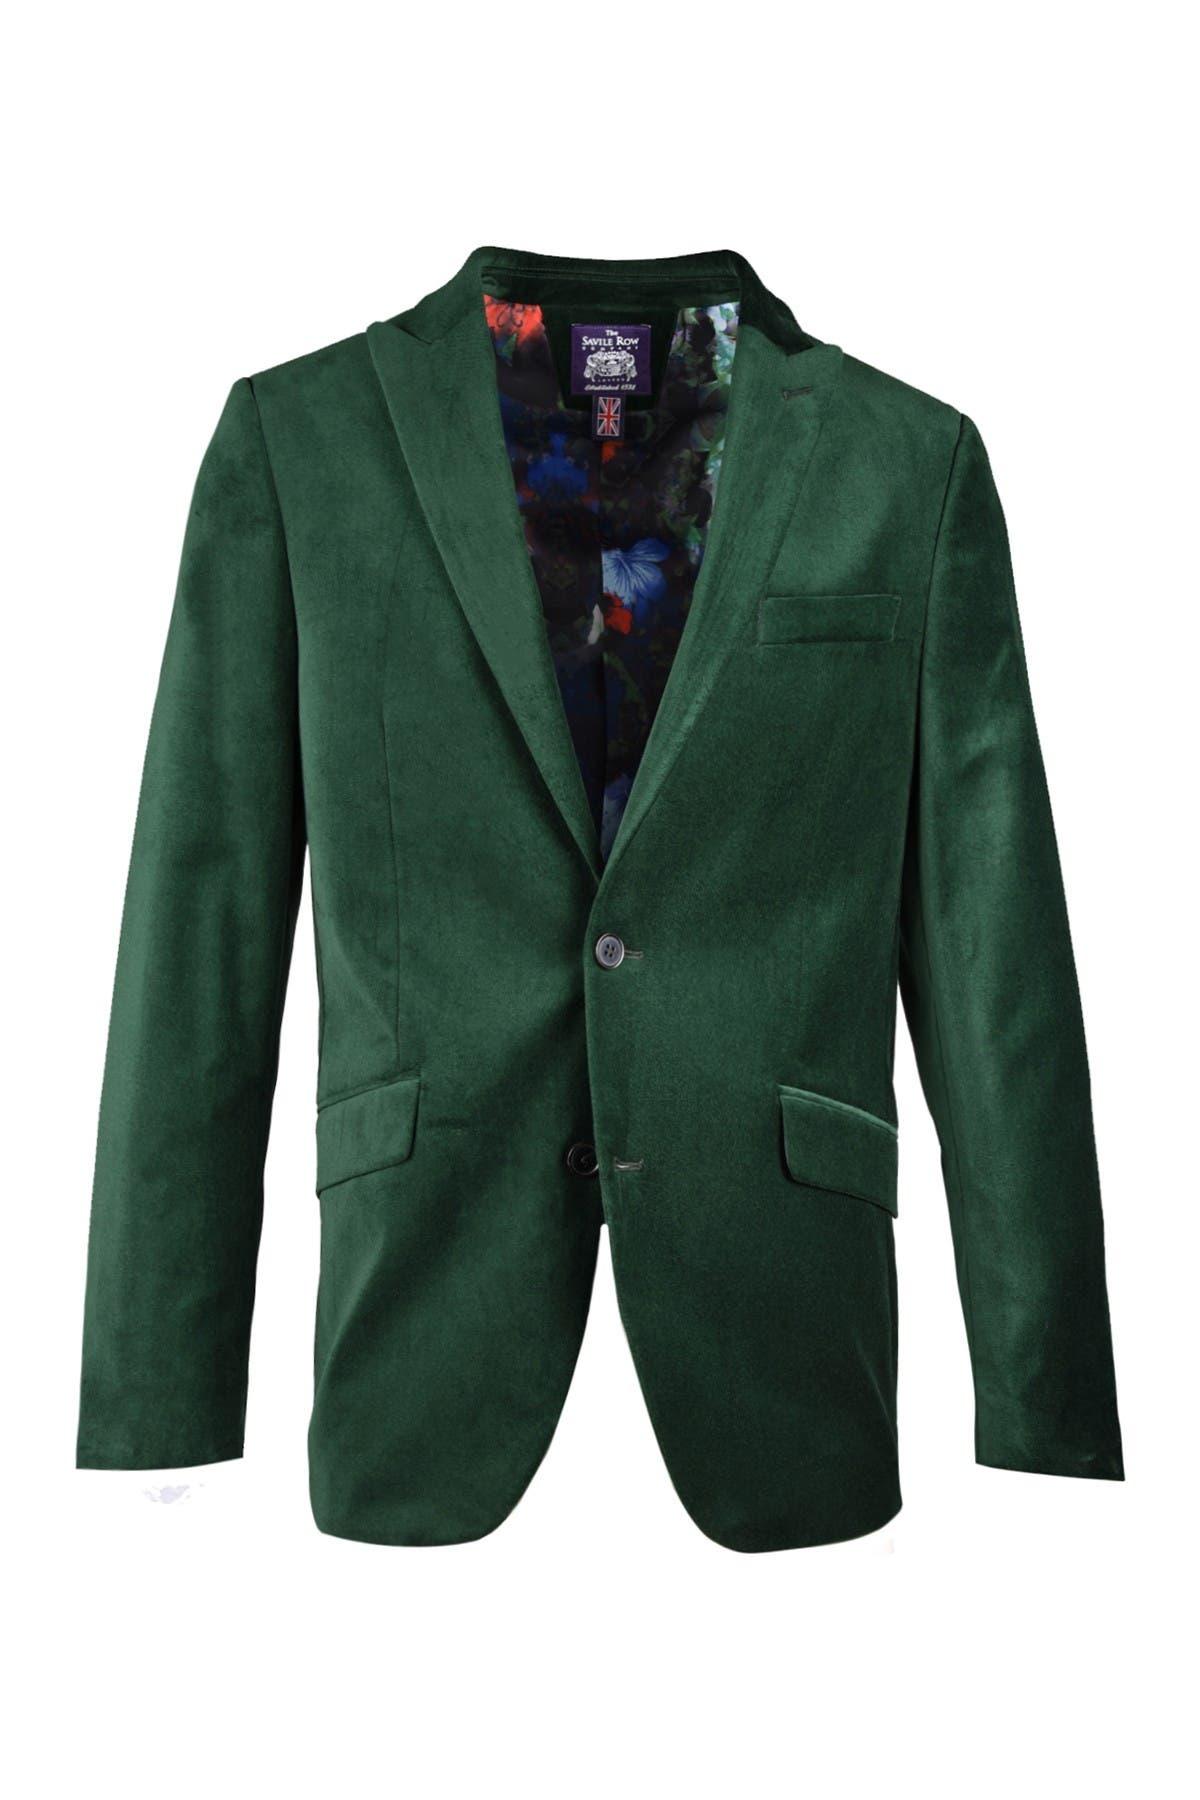 Image of SAVILE ROW CO Emerald Green Peak Lapel Slim Fit Velvet Blazer